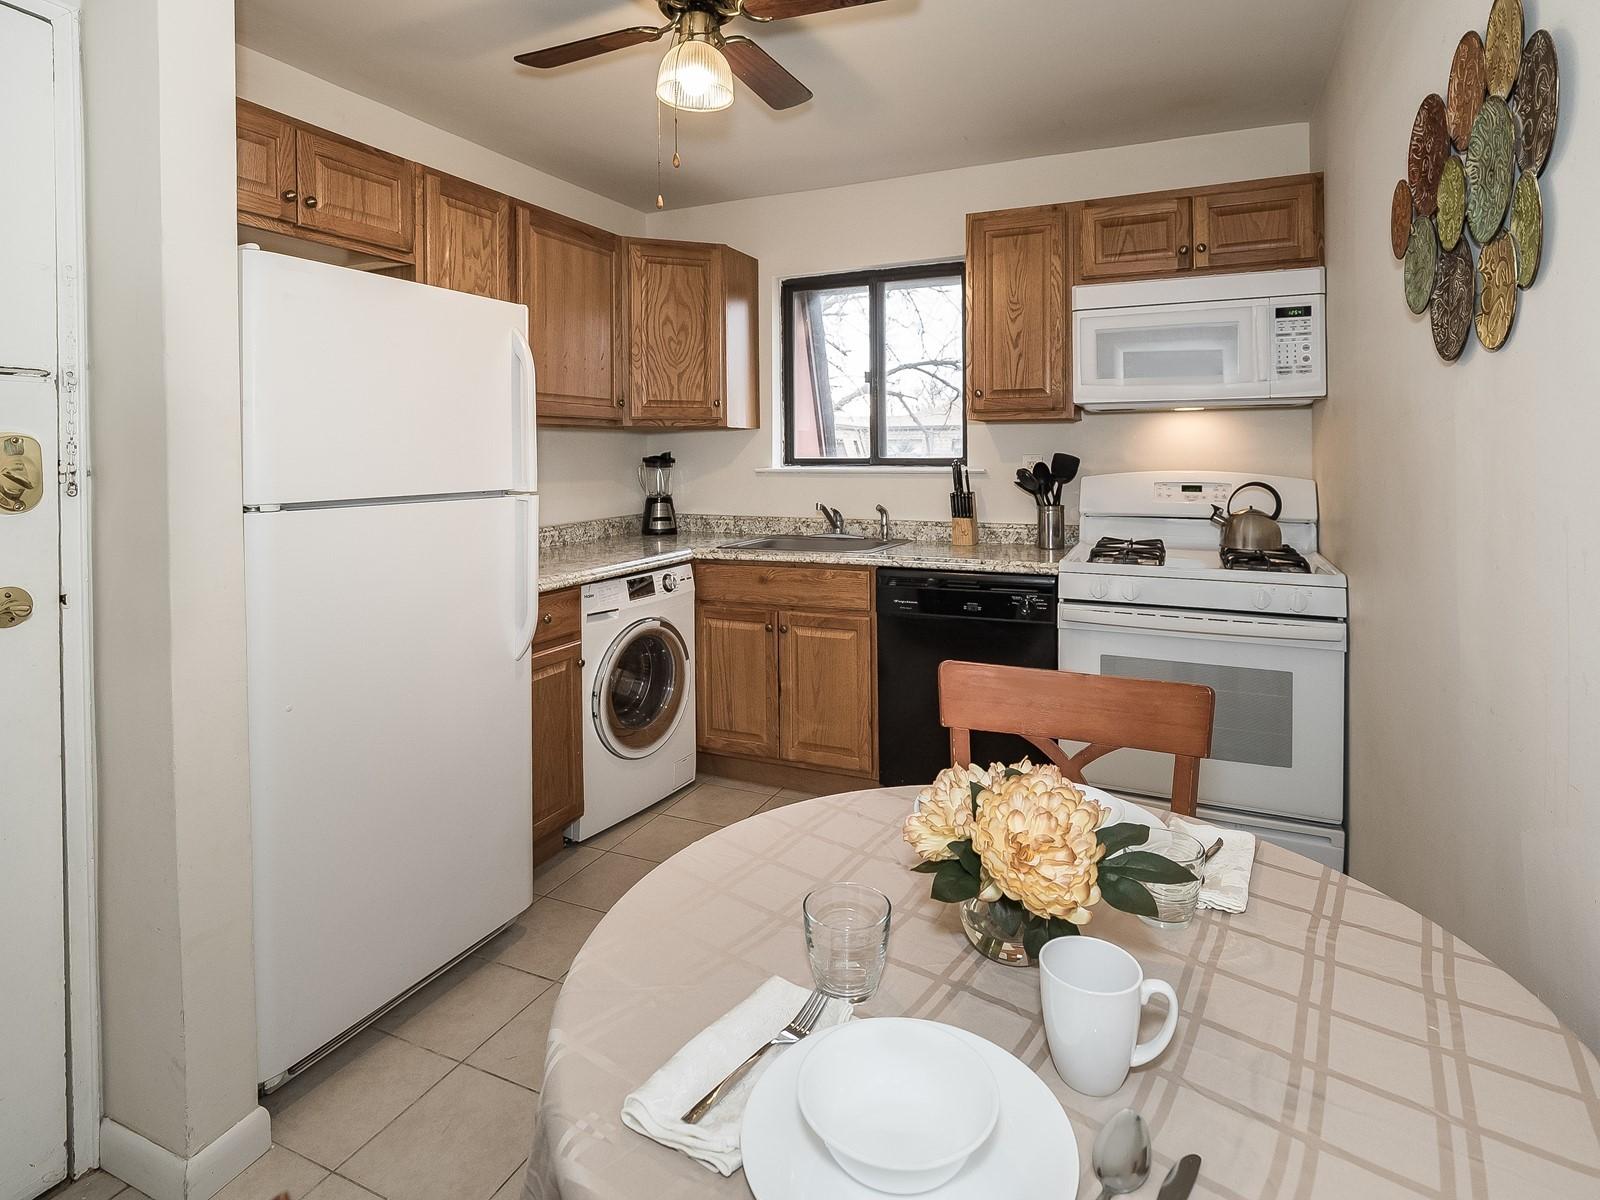 5_Furnished_Apartment_NorthBrunswickNJ_KitchenDining